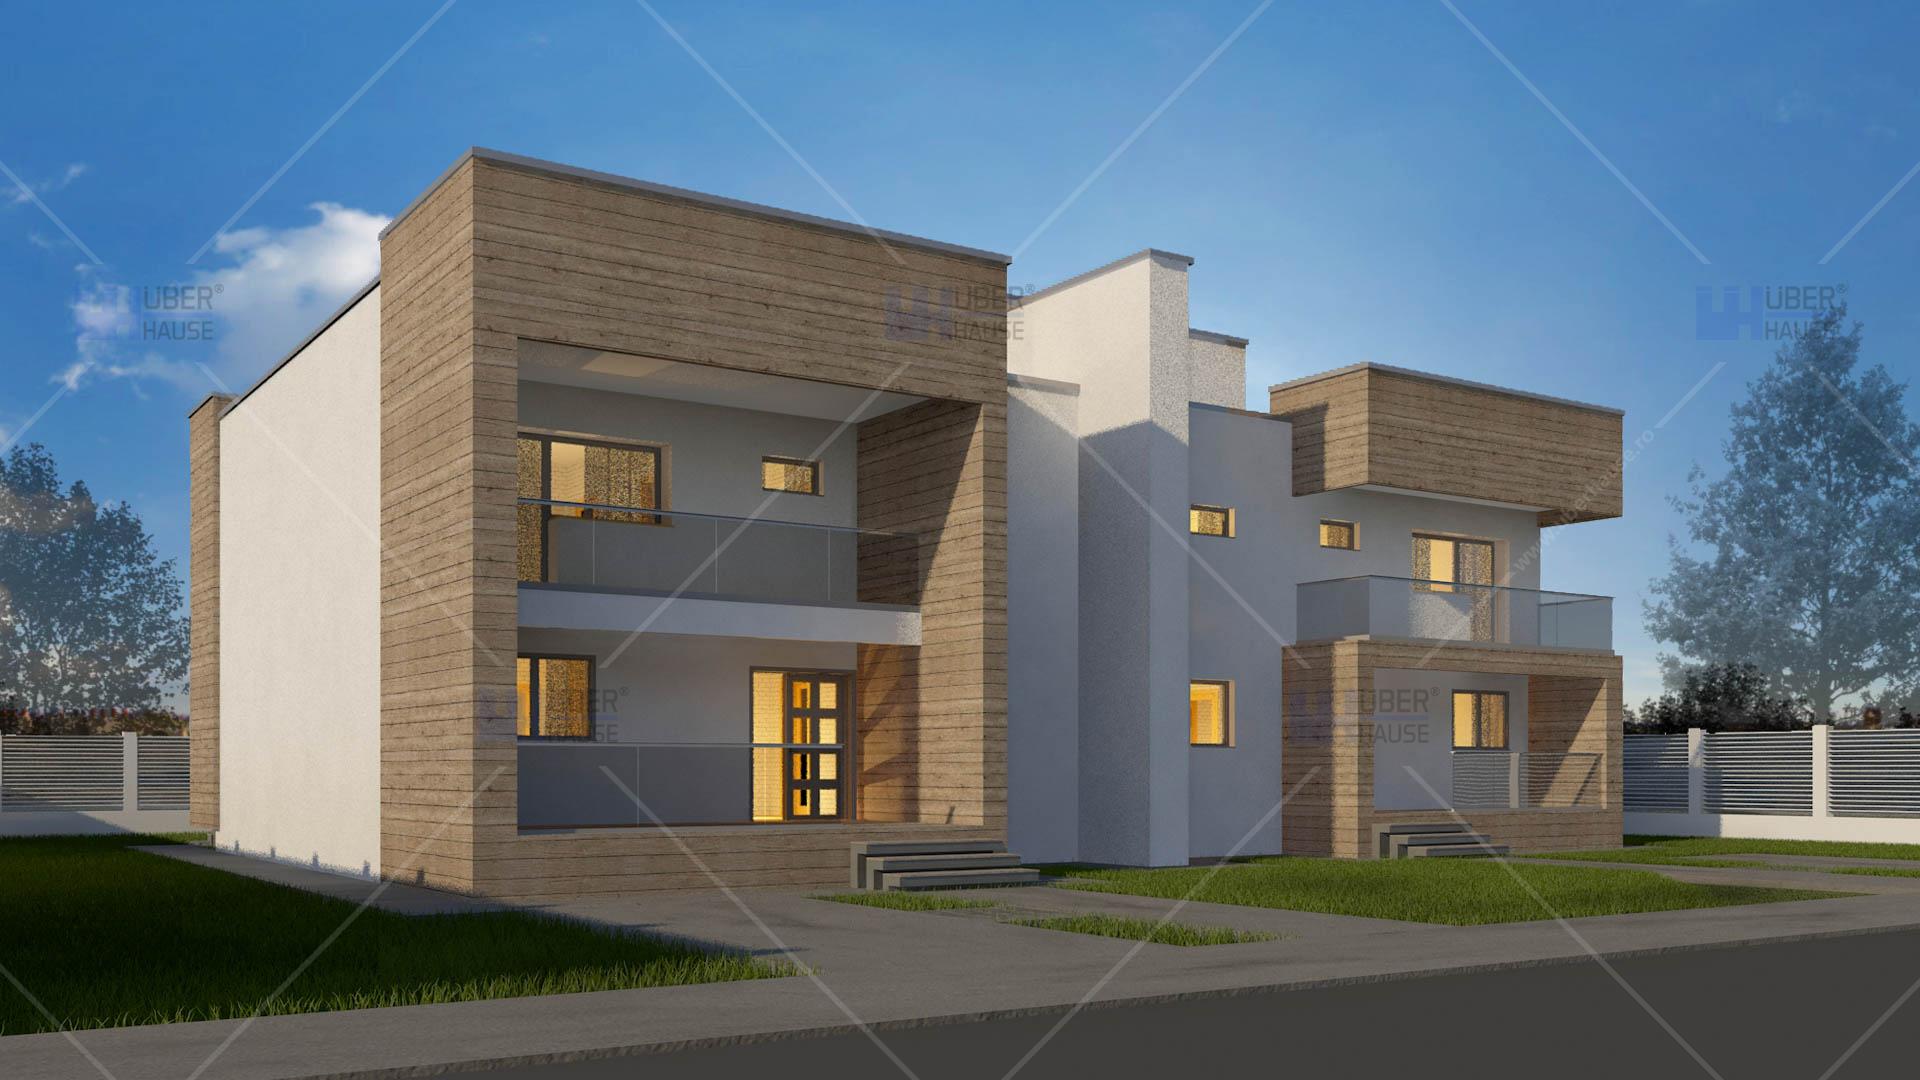 proiect duplex parter 2 etaje 394 mp dualis. Black Bedroom Furniture Sets. Home Design Ideas